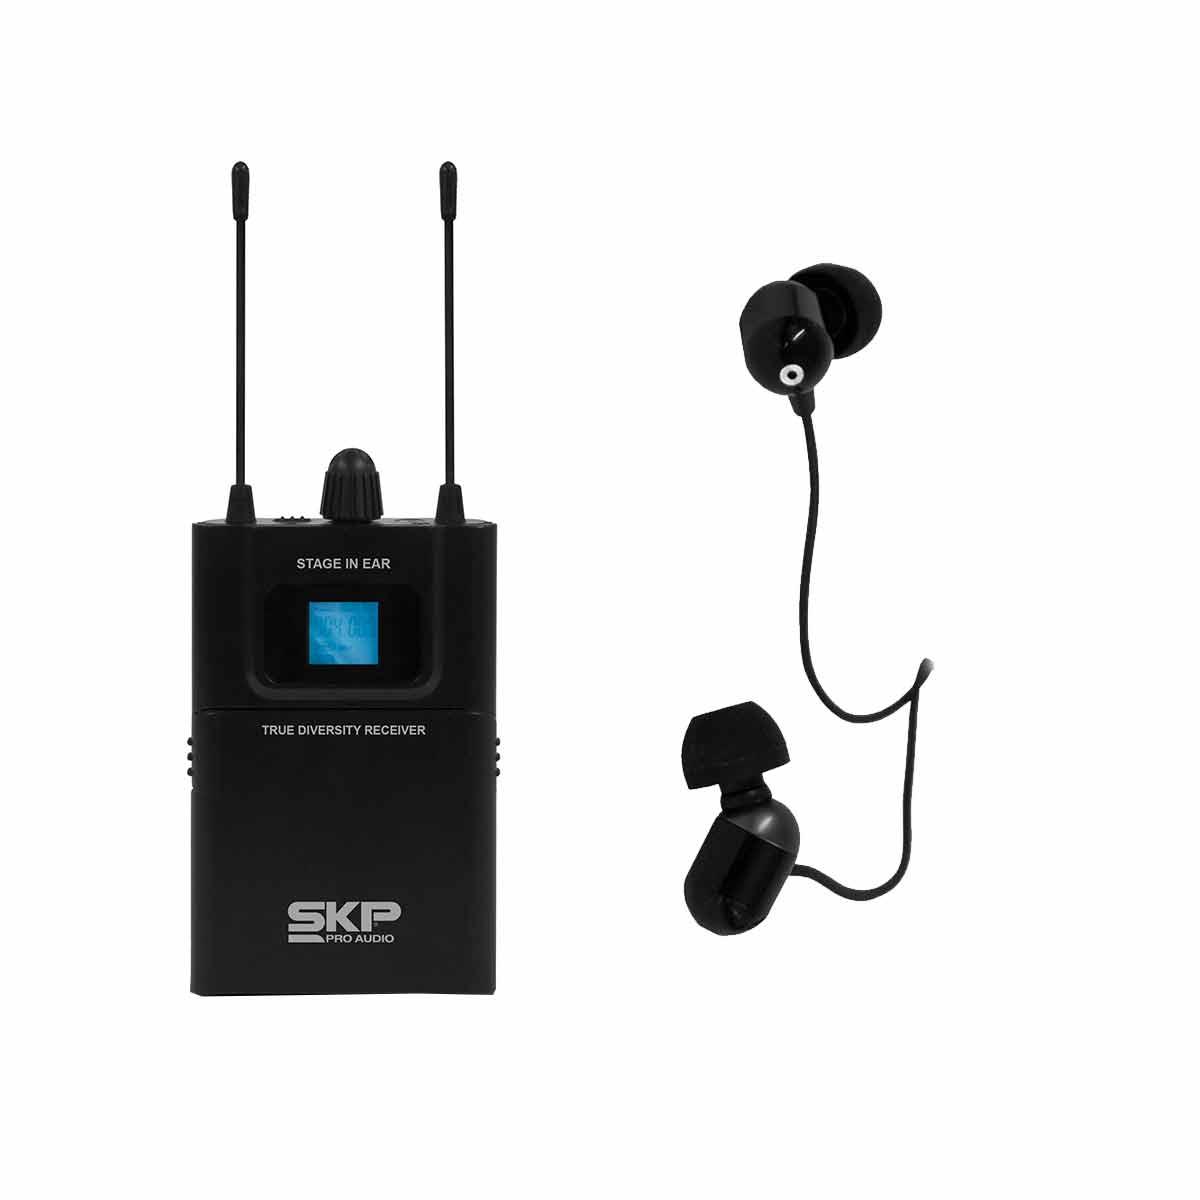 STAGEINEAR Ponto Eletrônico s/ Fio c/ Fone In-ear STAGE IN EAR - SKP